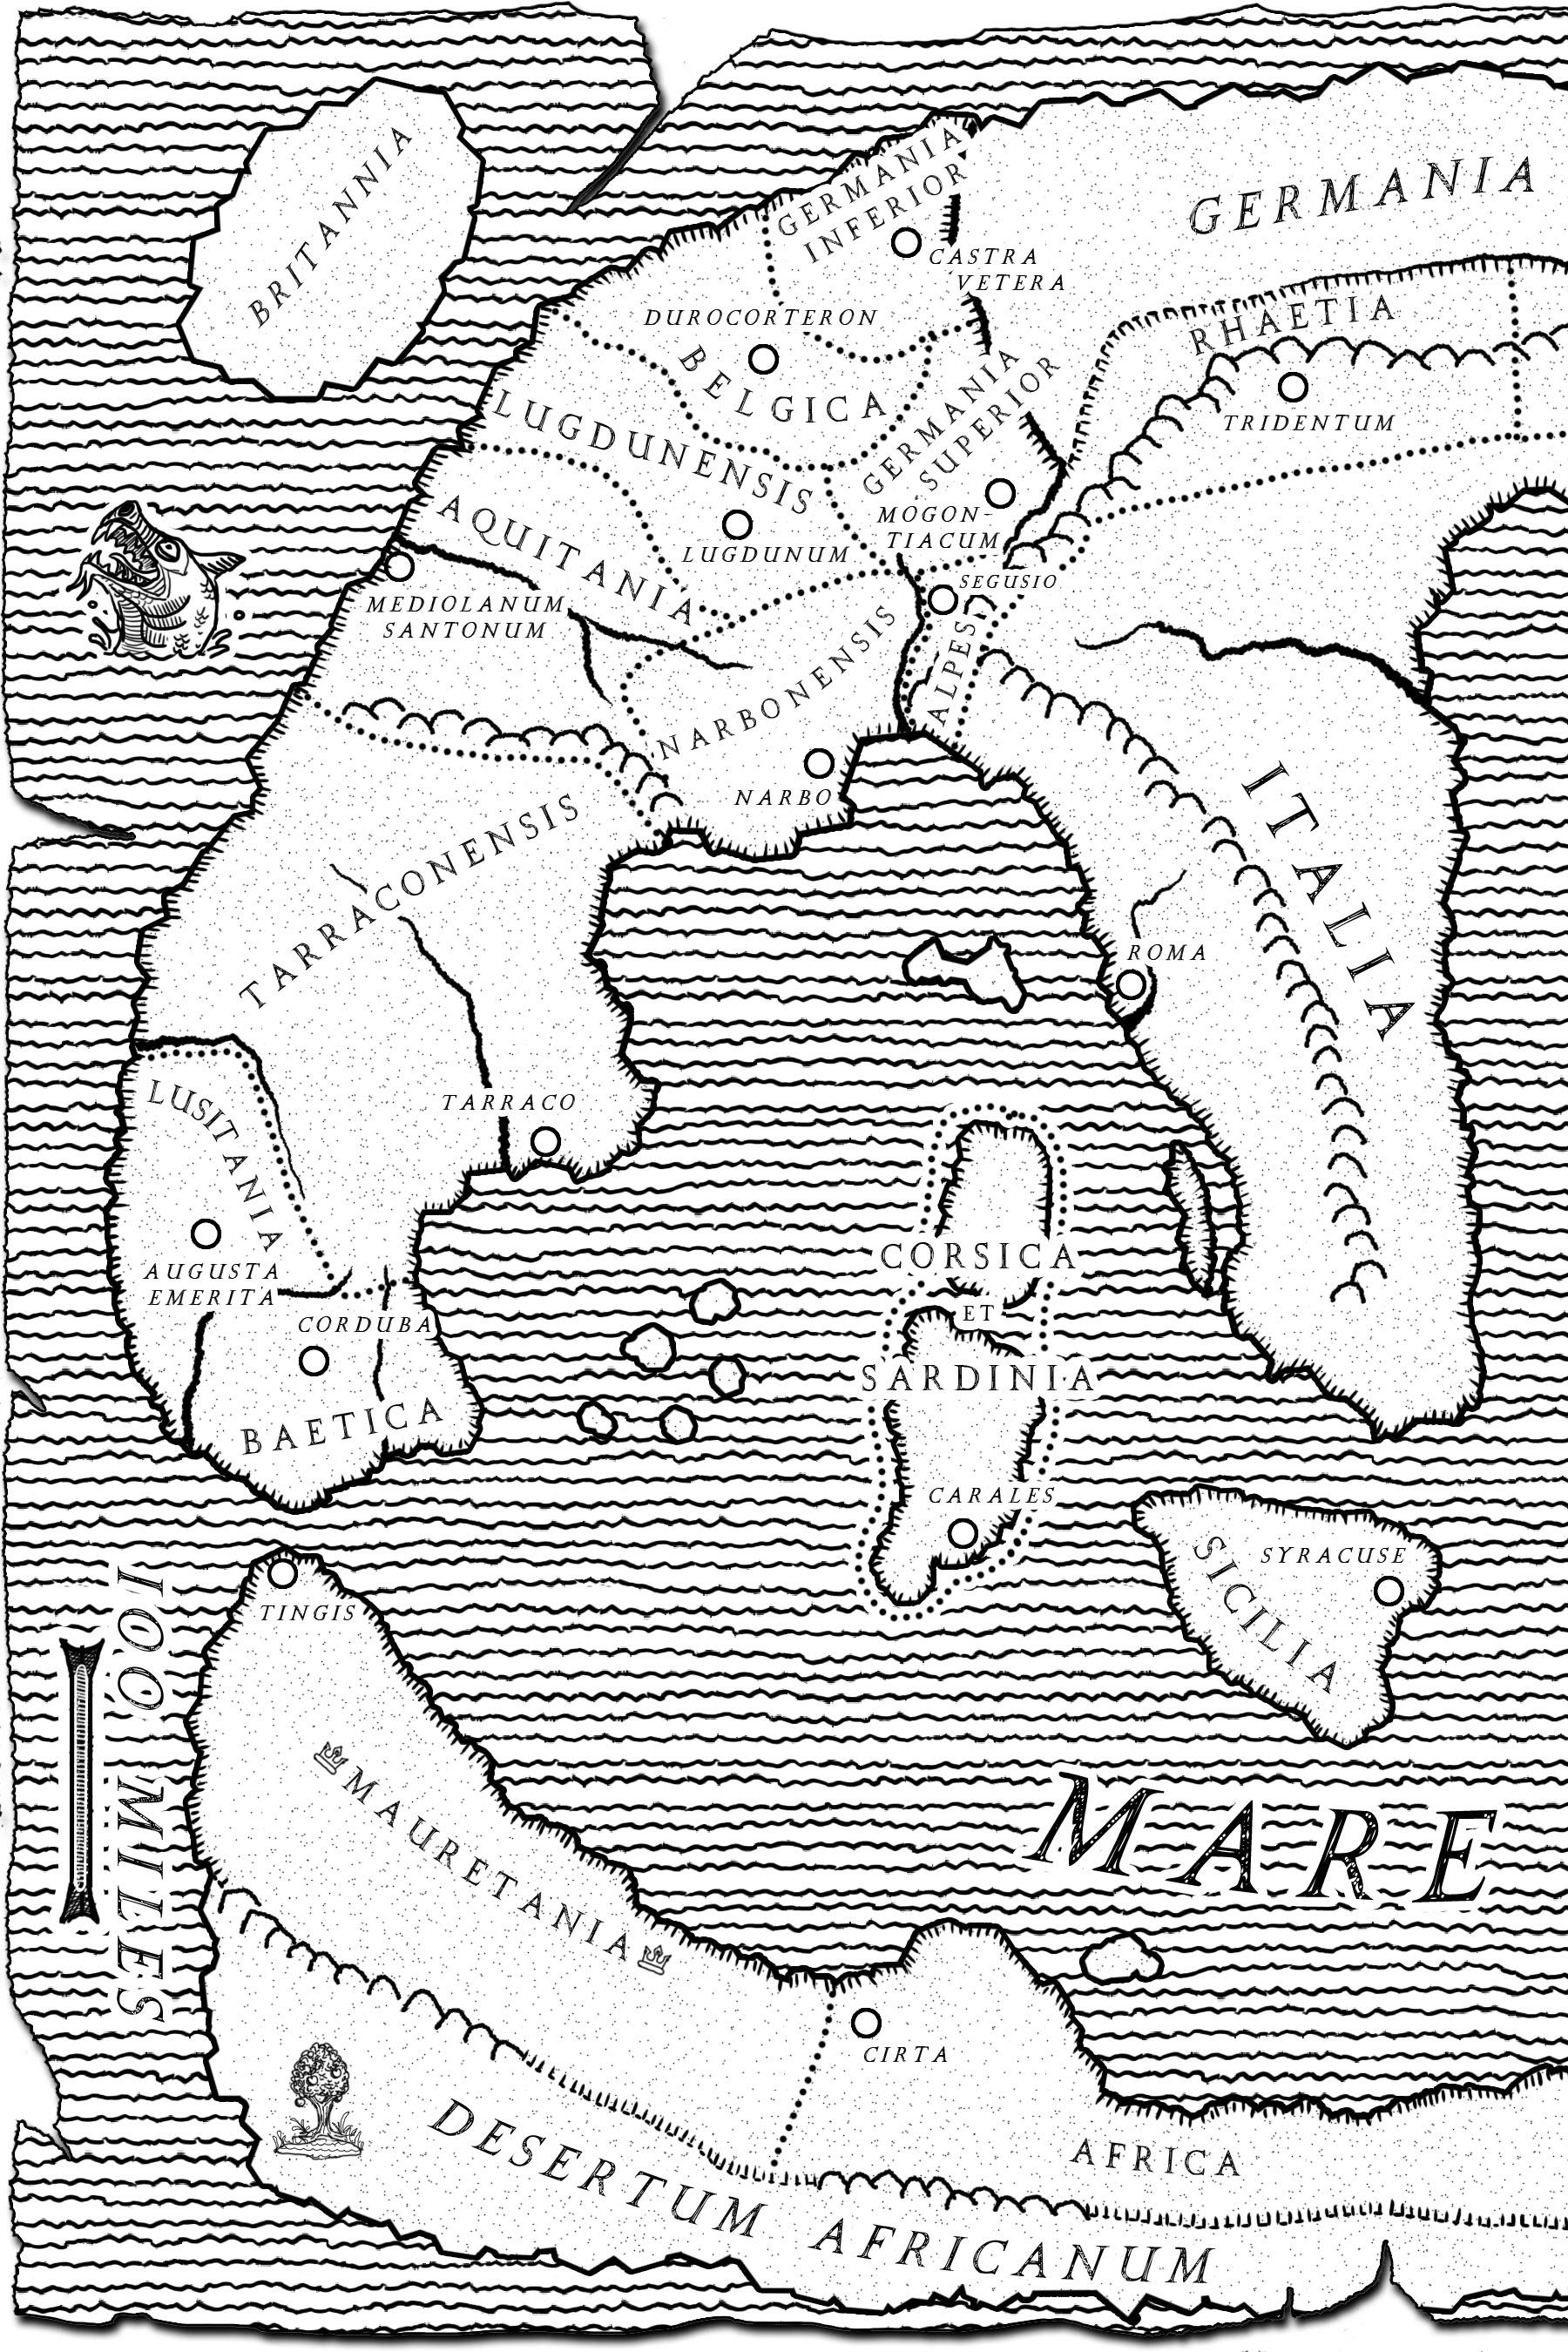 IMAGE 3 SOG MAP